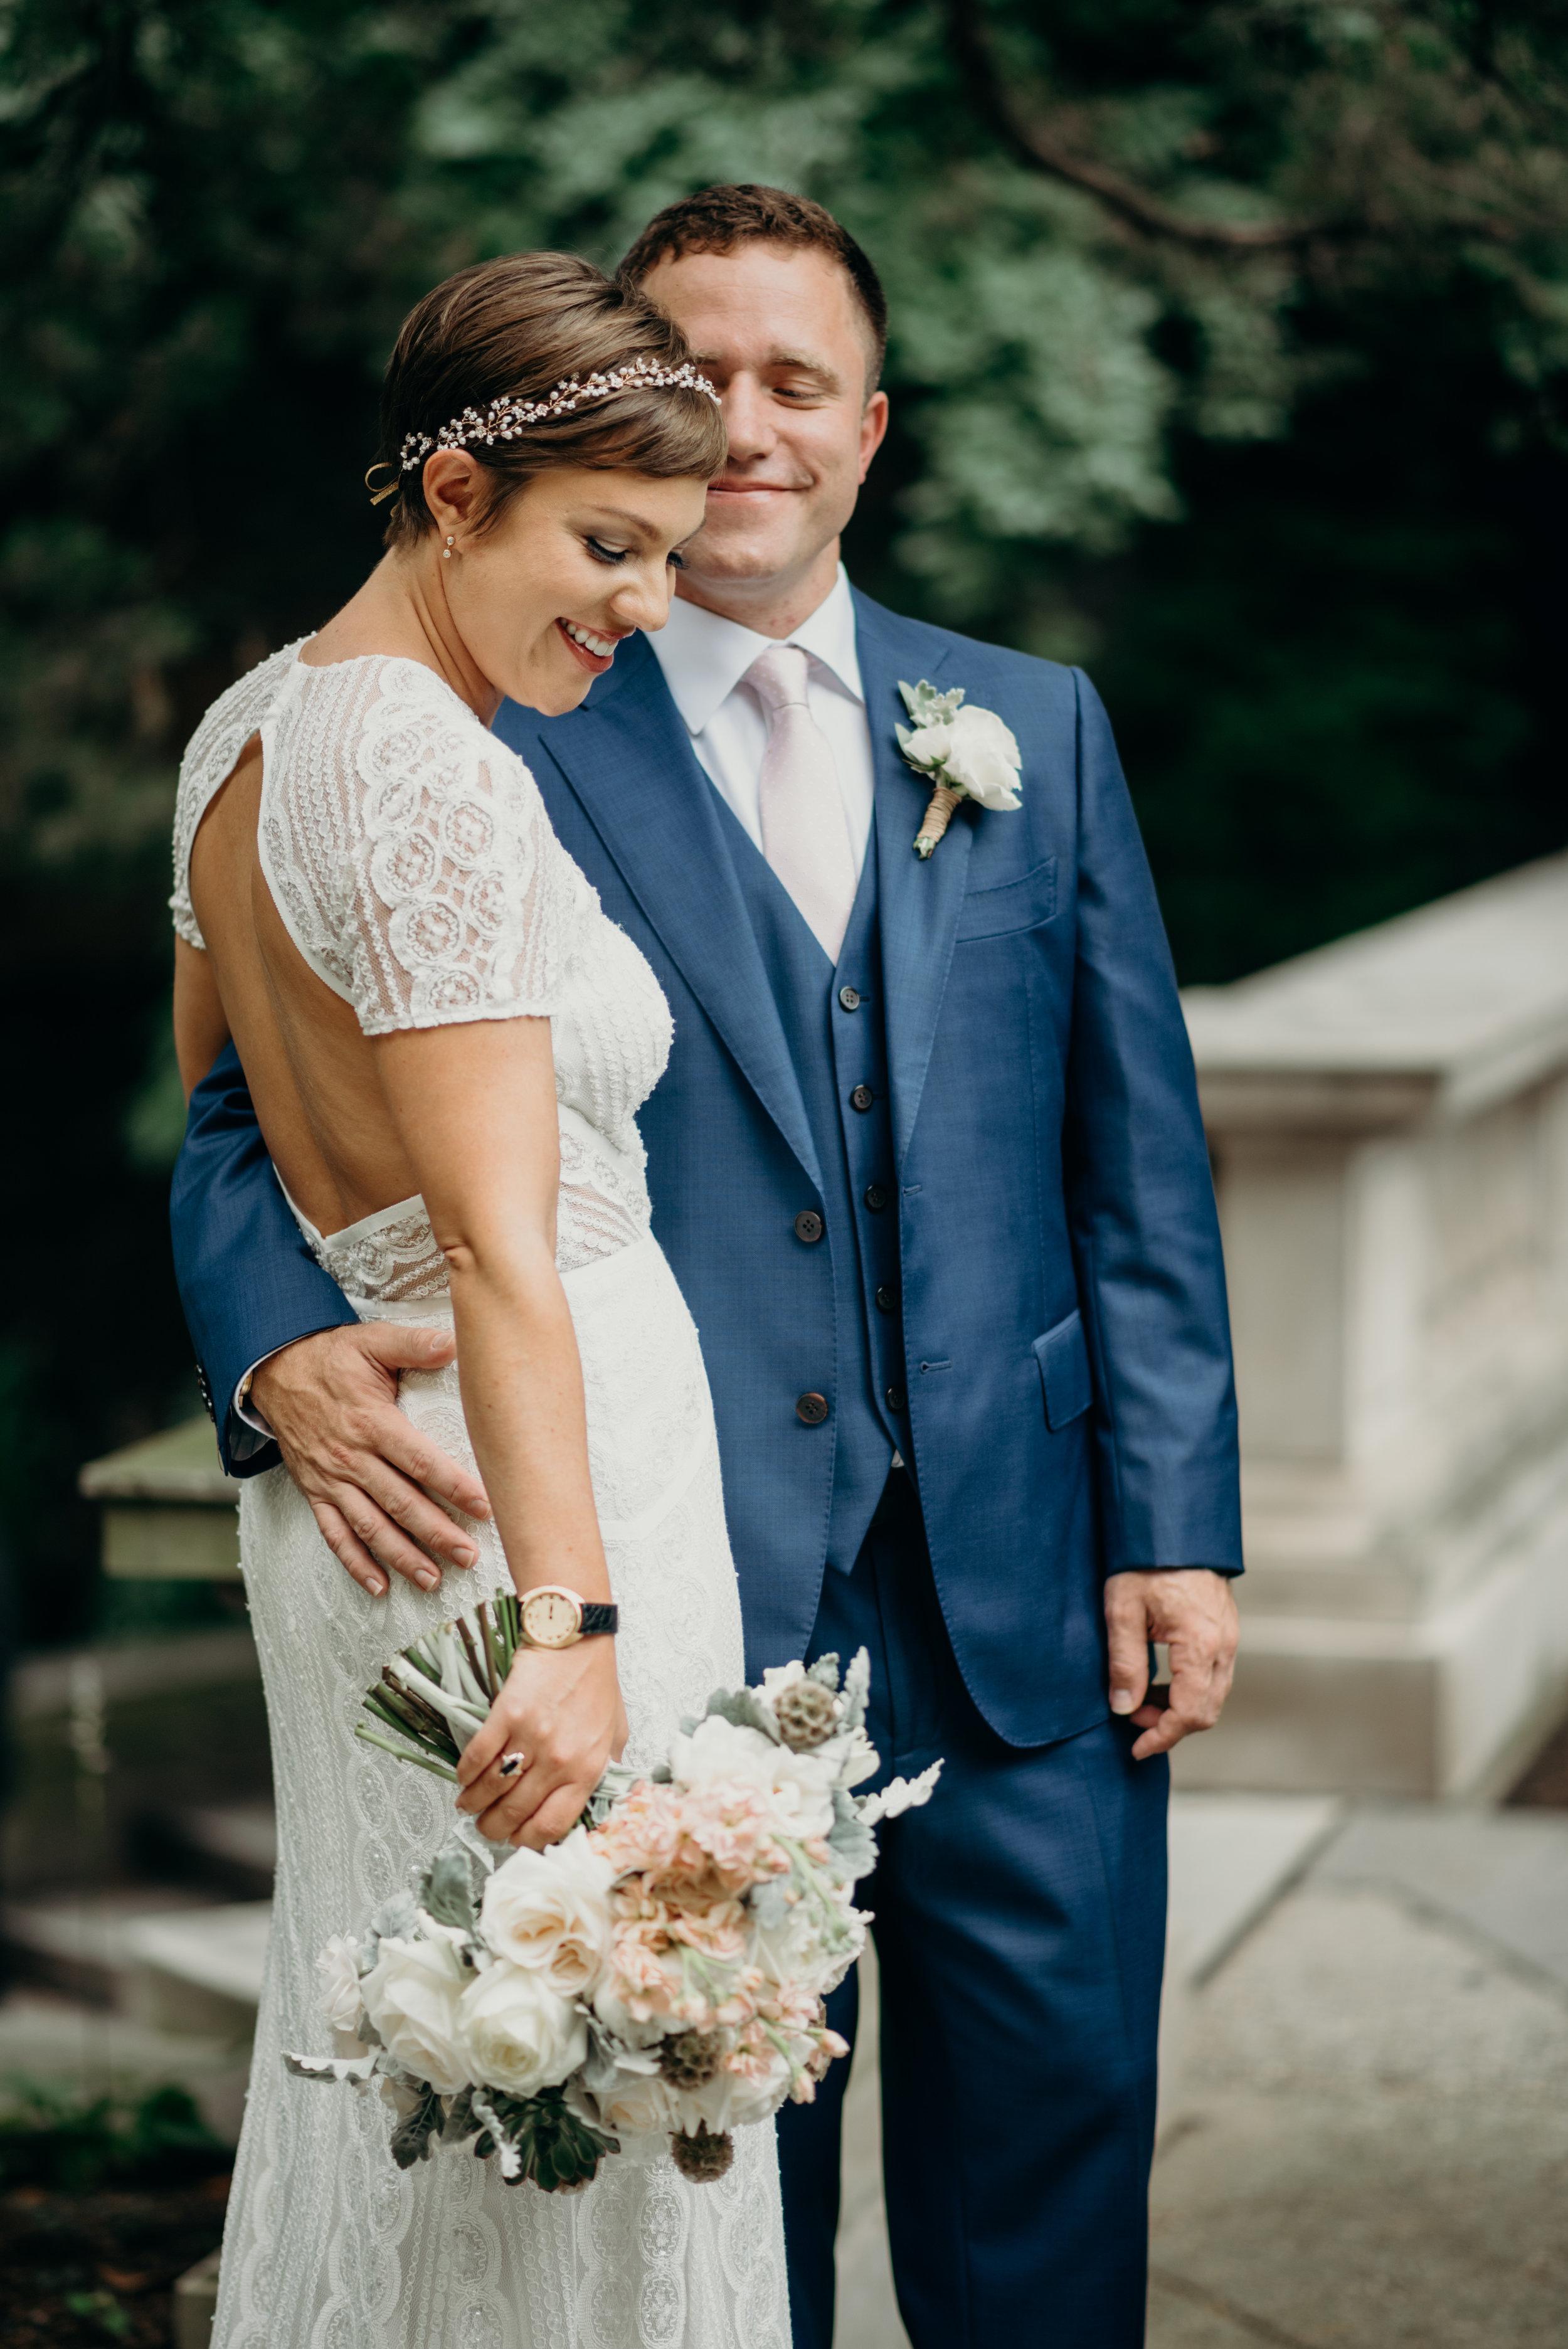 DC-BALTIMORE-WEDDING-PHOTOGRAPHER-MEGAN-GRAHAM-PHOTOGRAPHY-3604.jpg